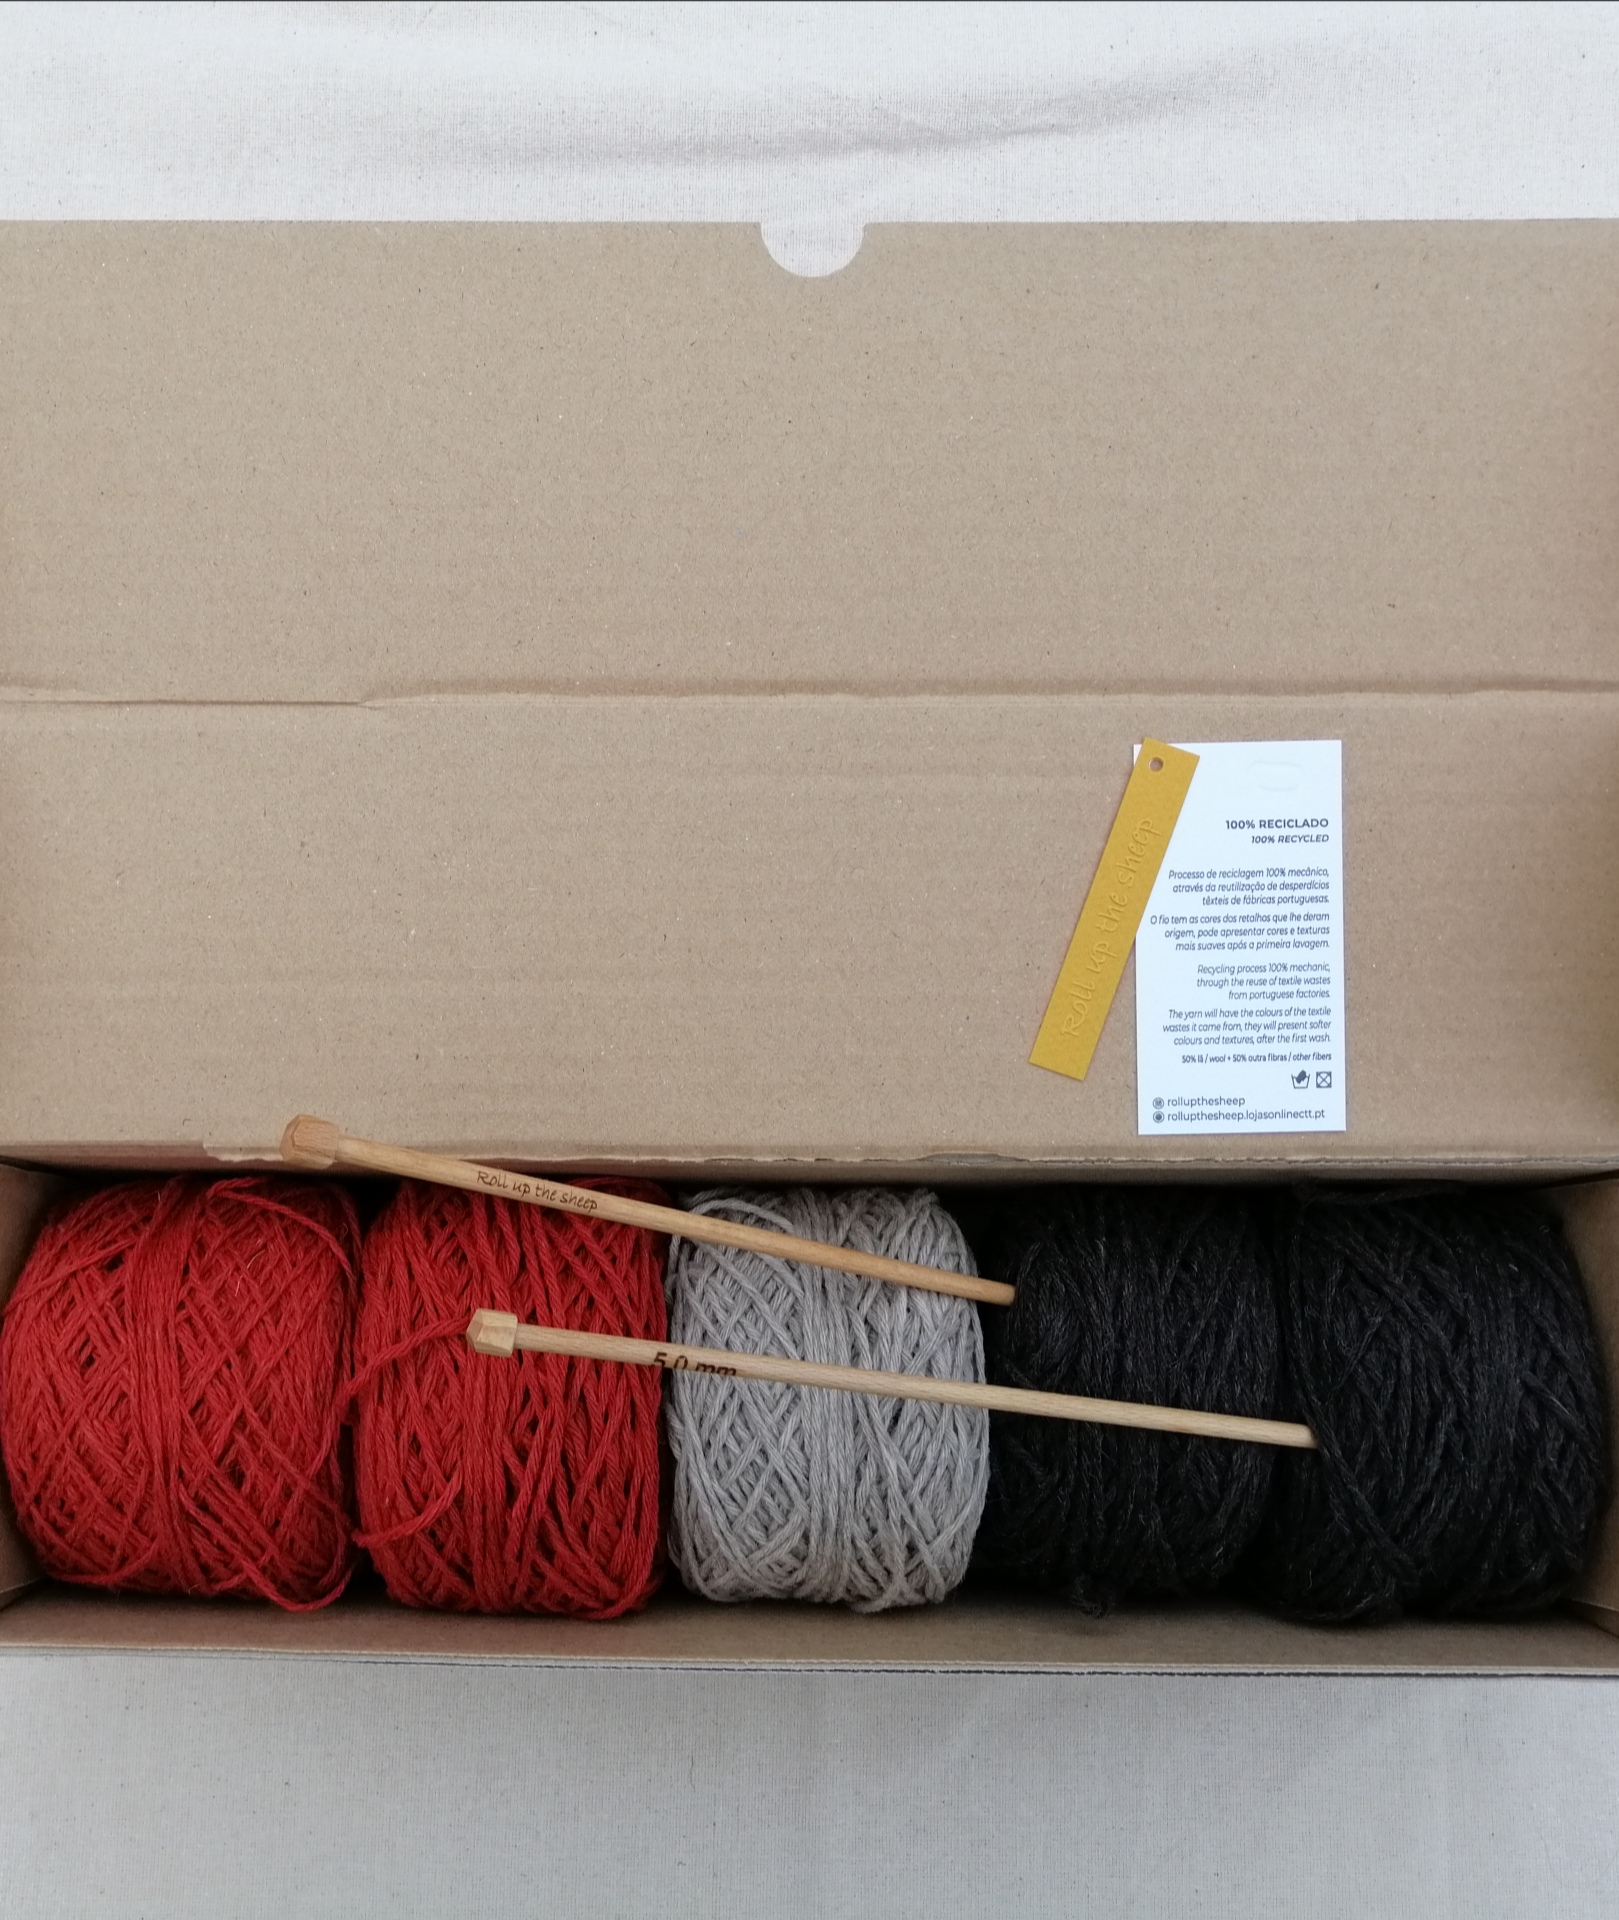 Caixa 5 novelos c/Agulhas tricot Roll up the sheep (250gr)